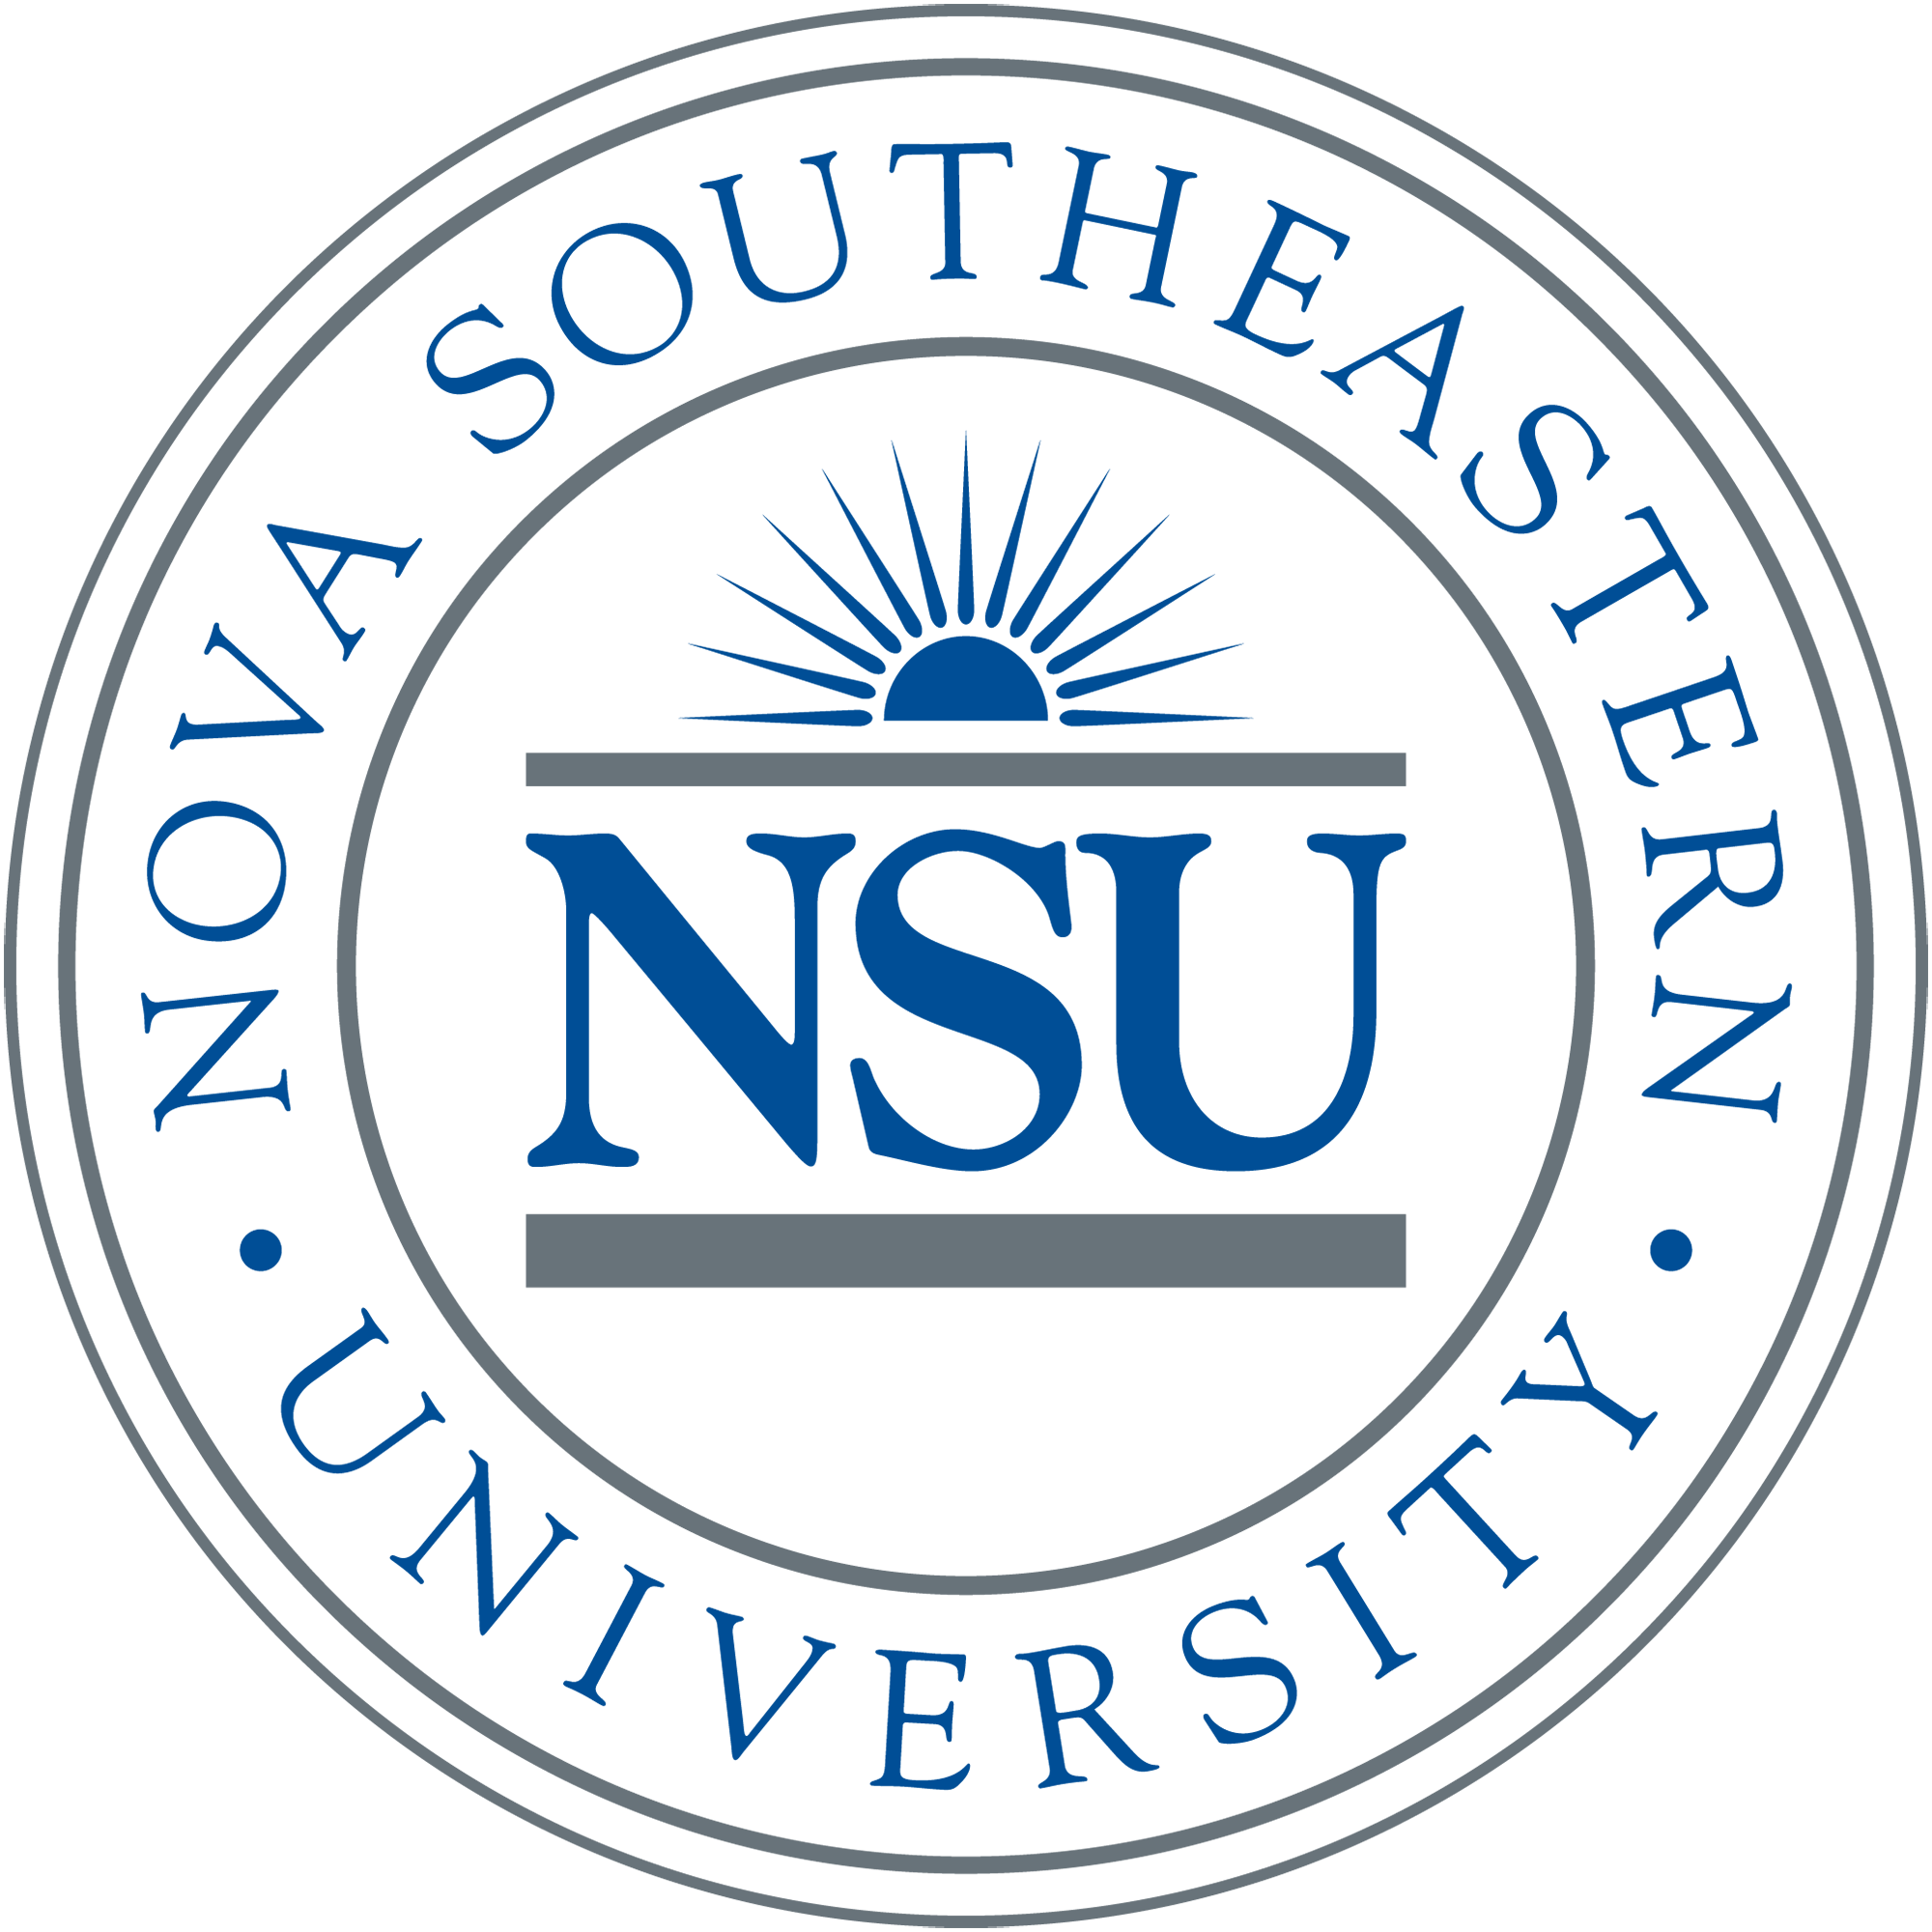 Nova Southeastern University College of Dental Medicine - Wikipedia